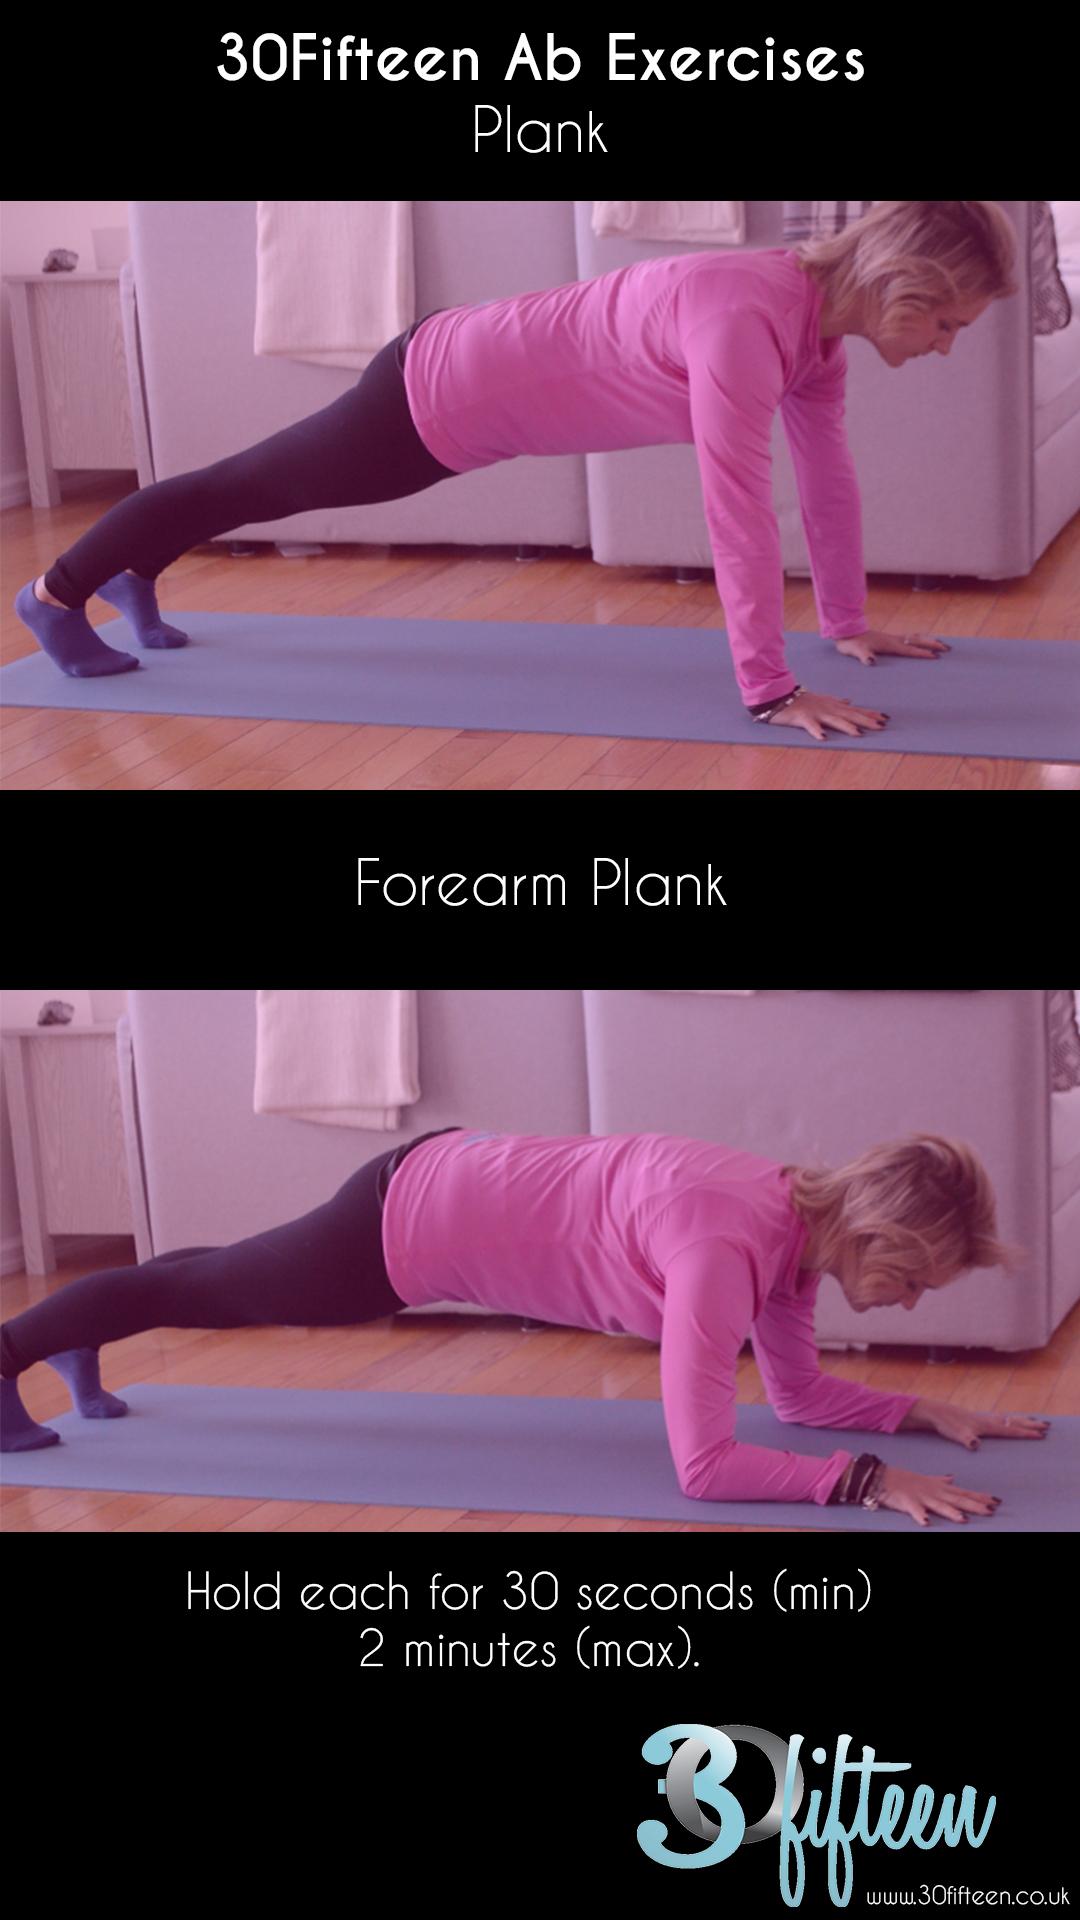 30Fifteen ab exercises plank & forearm.jpg